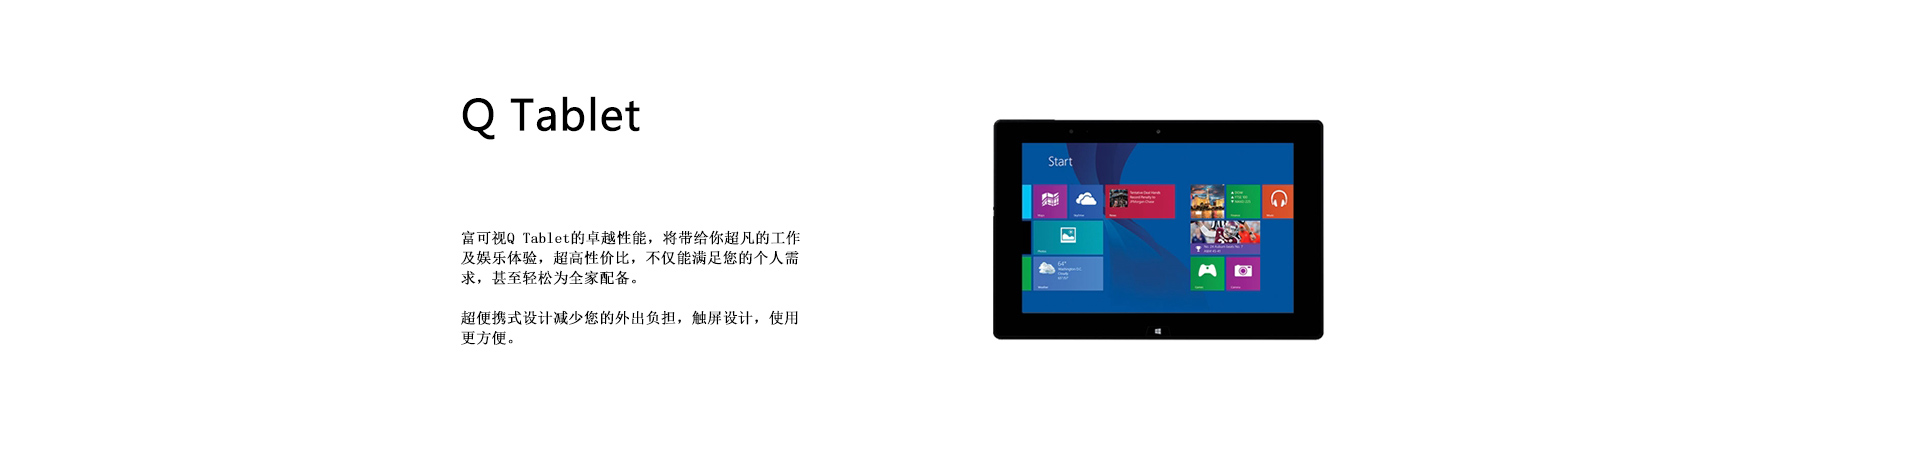 Q-tablet